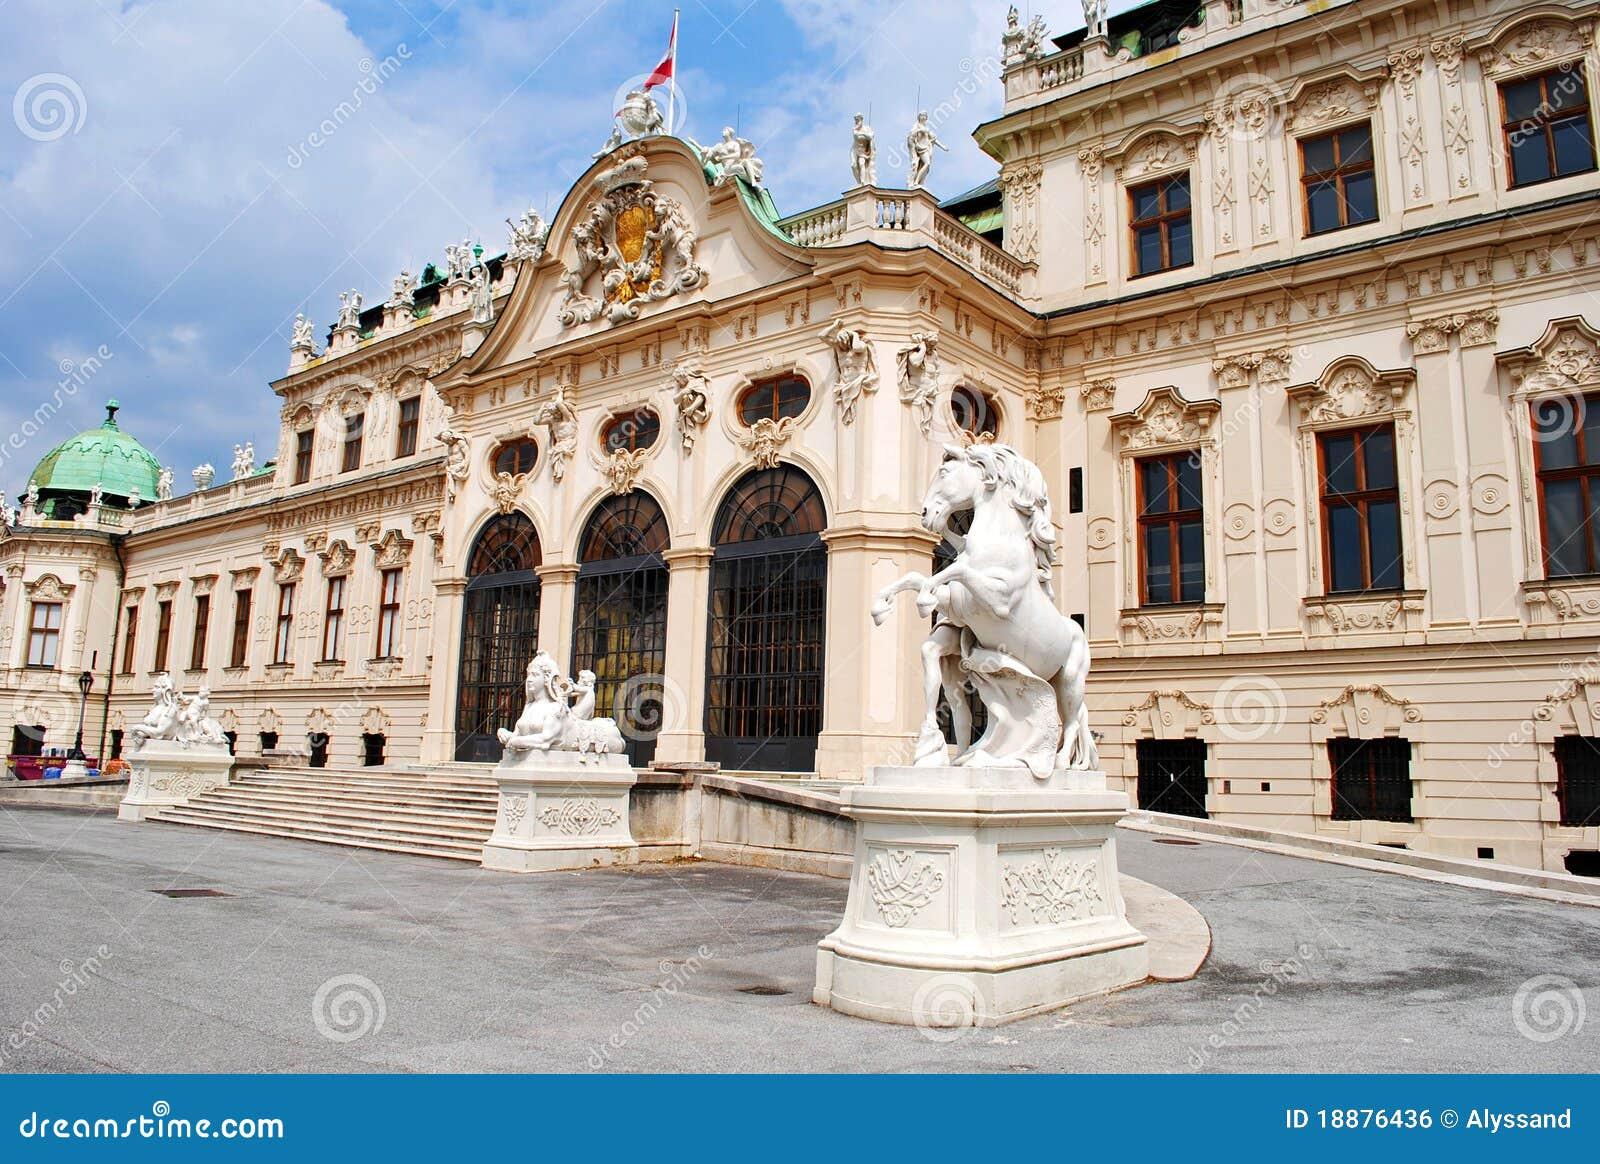 Belvedere-Palast